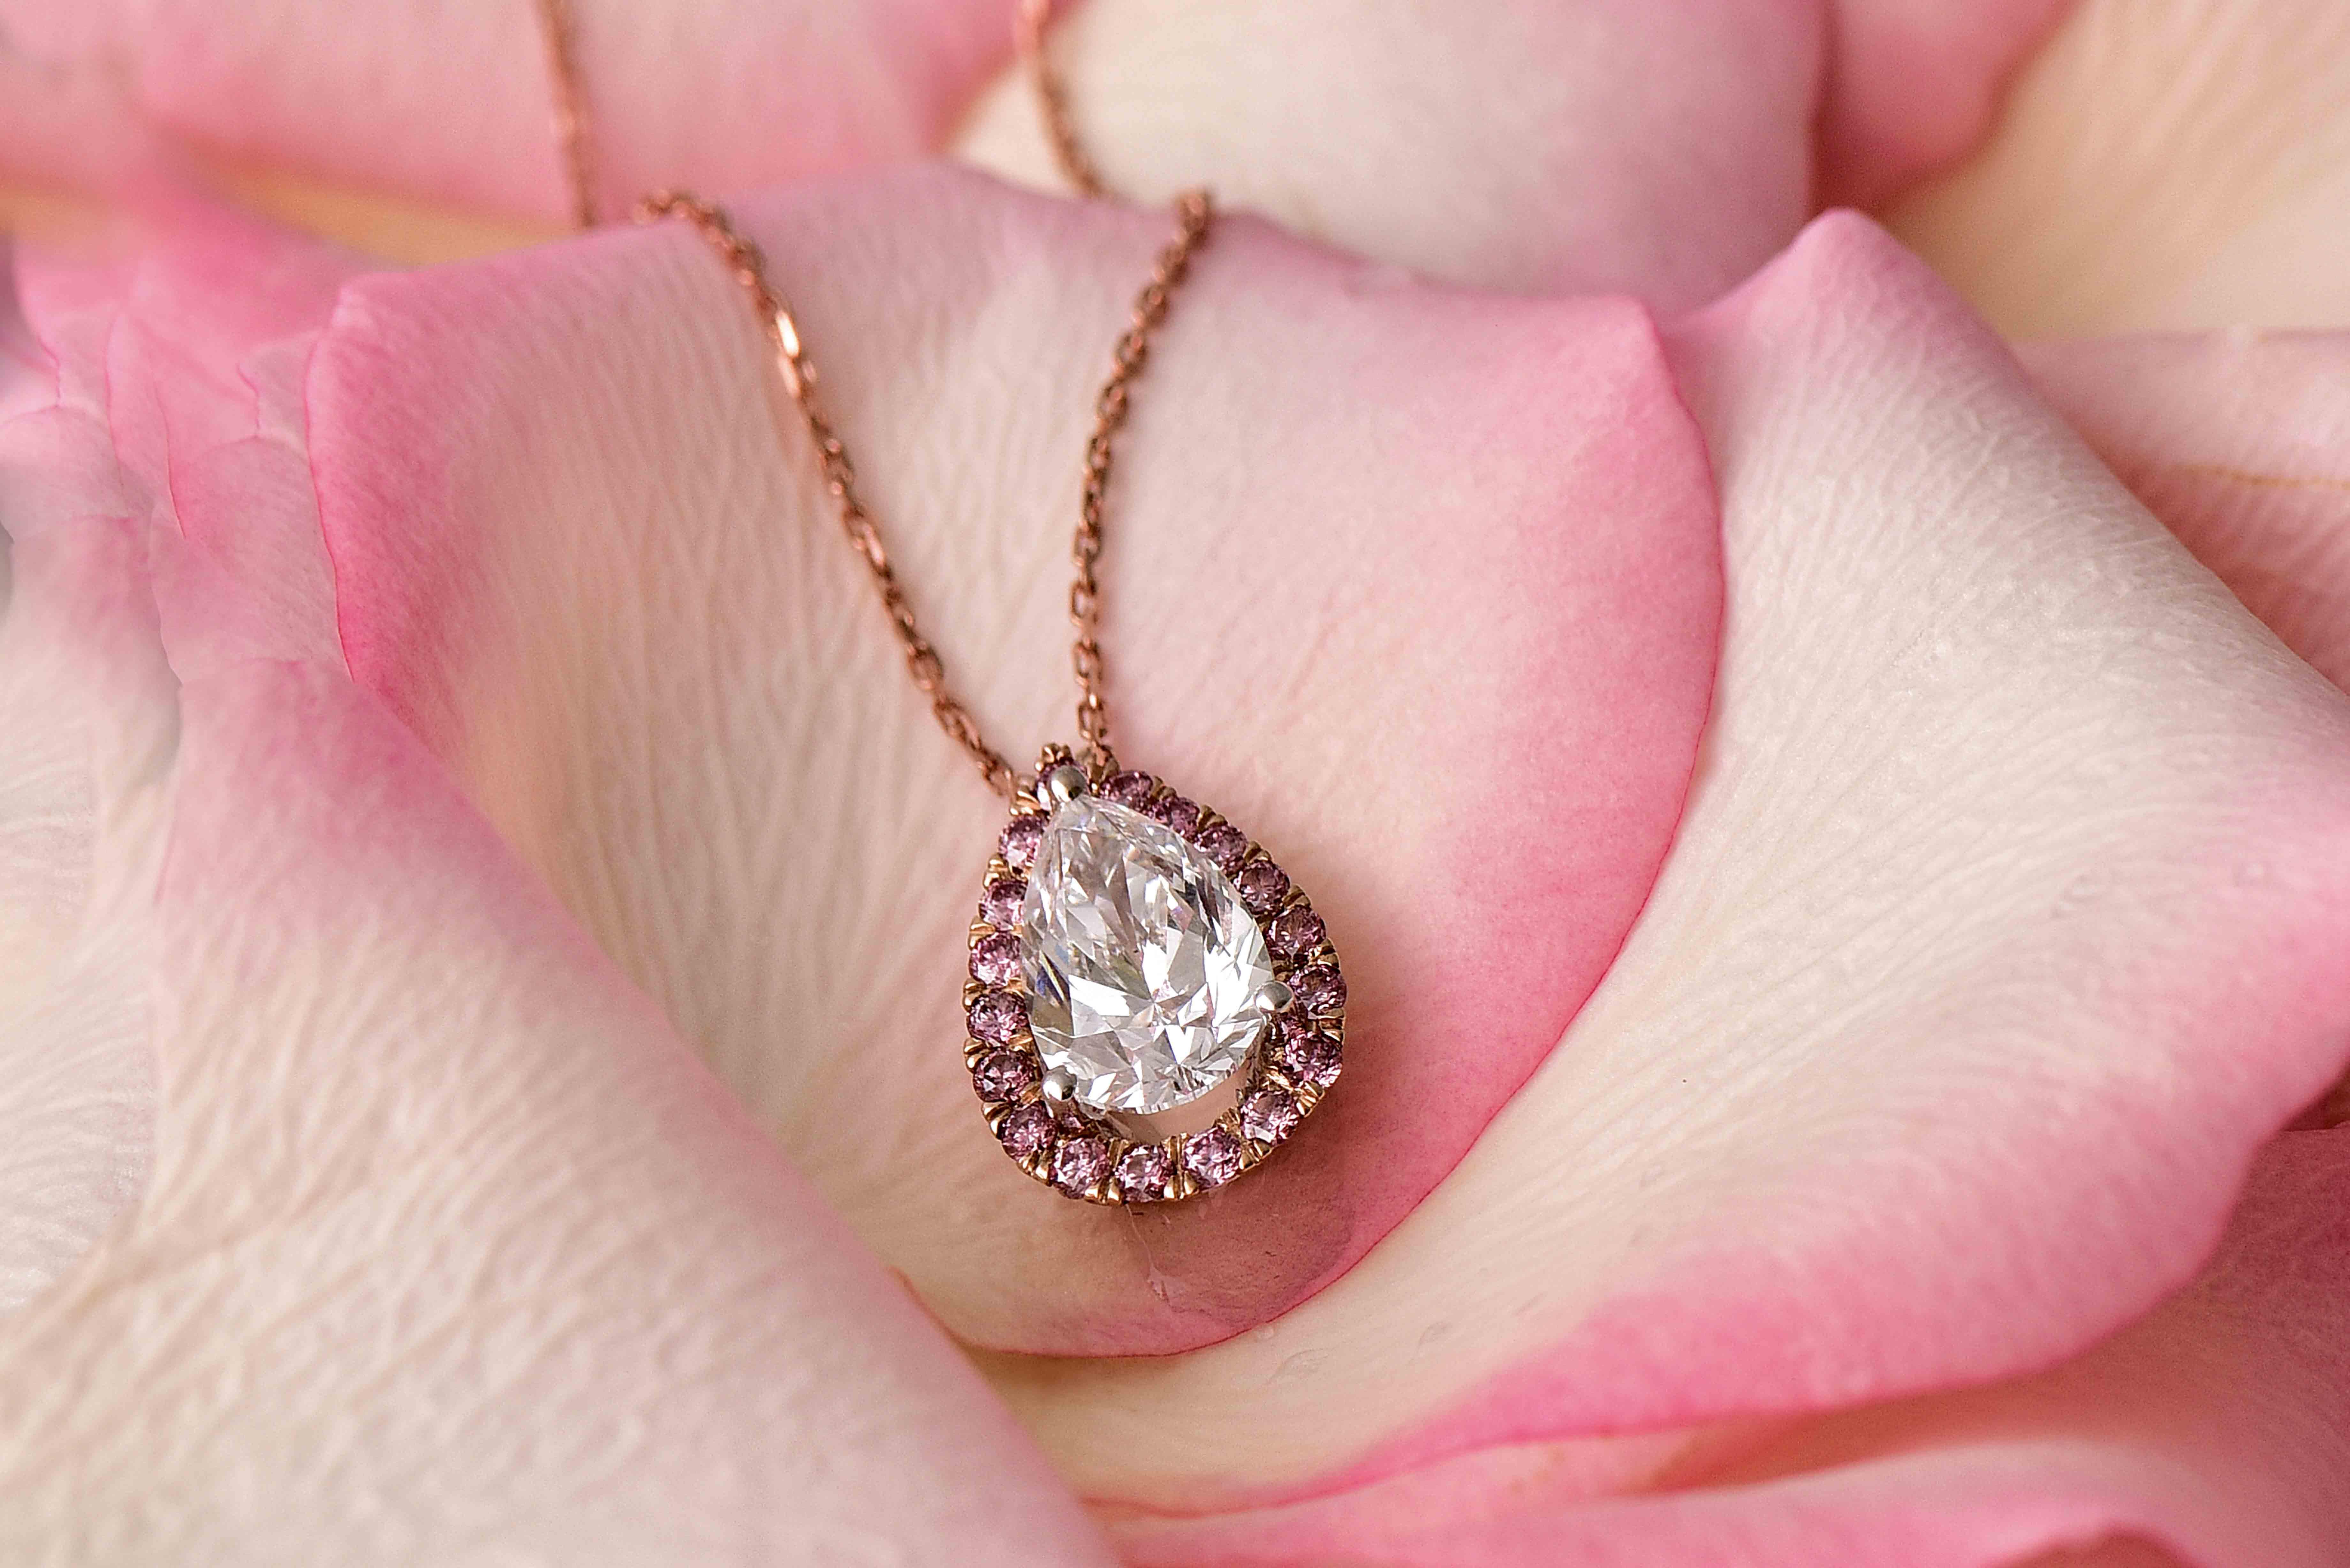 0df019e86b9f4 دار Dhamani الرائدة في مجال تصميم المجوهرات اختيرت لتكون المحترف المتخصص  لدار Argyle Pink Diamonds في الشرق الأوسط. House of Dhamani التي أنشئت في  العام ...